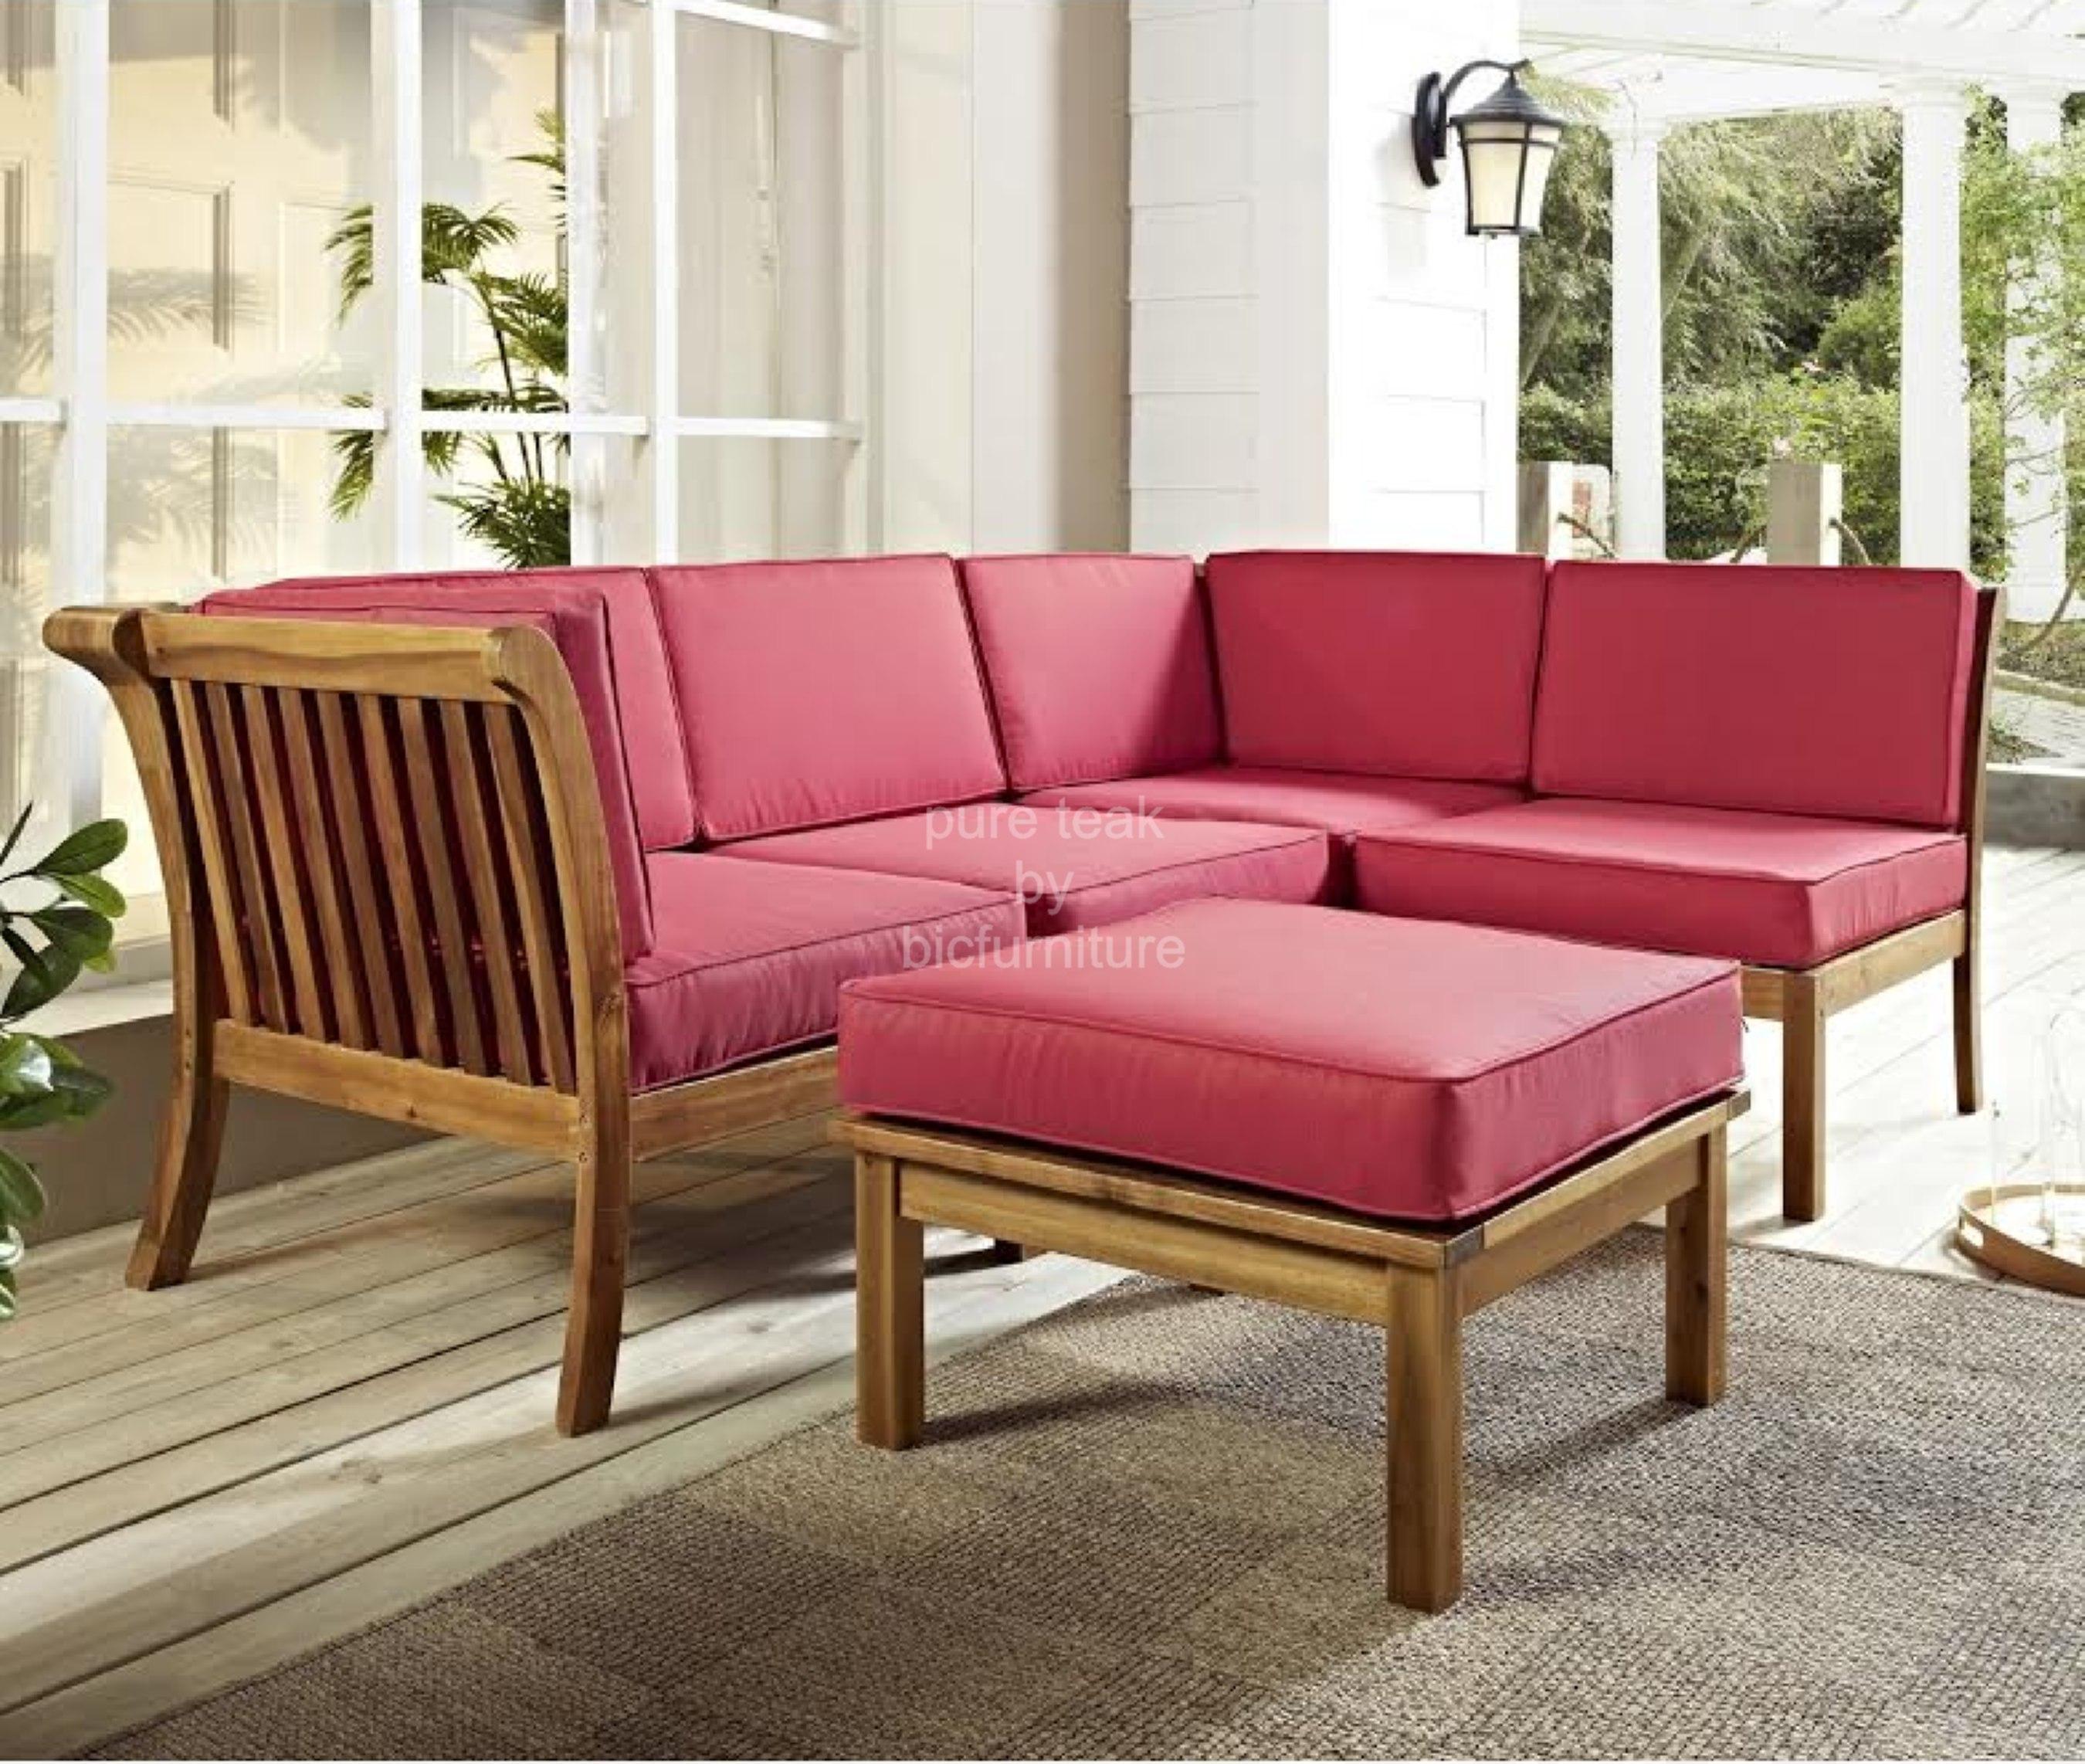 l shape sofa set designs in delhi nicoletti leather sofas archives wooden furniture teak wood add to wishlist loading